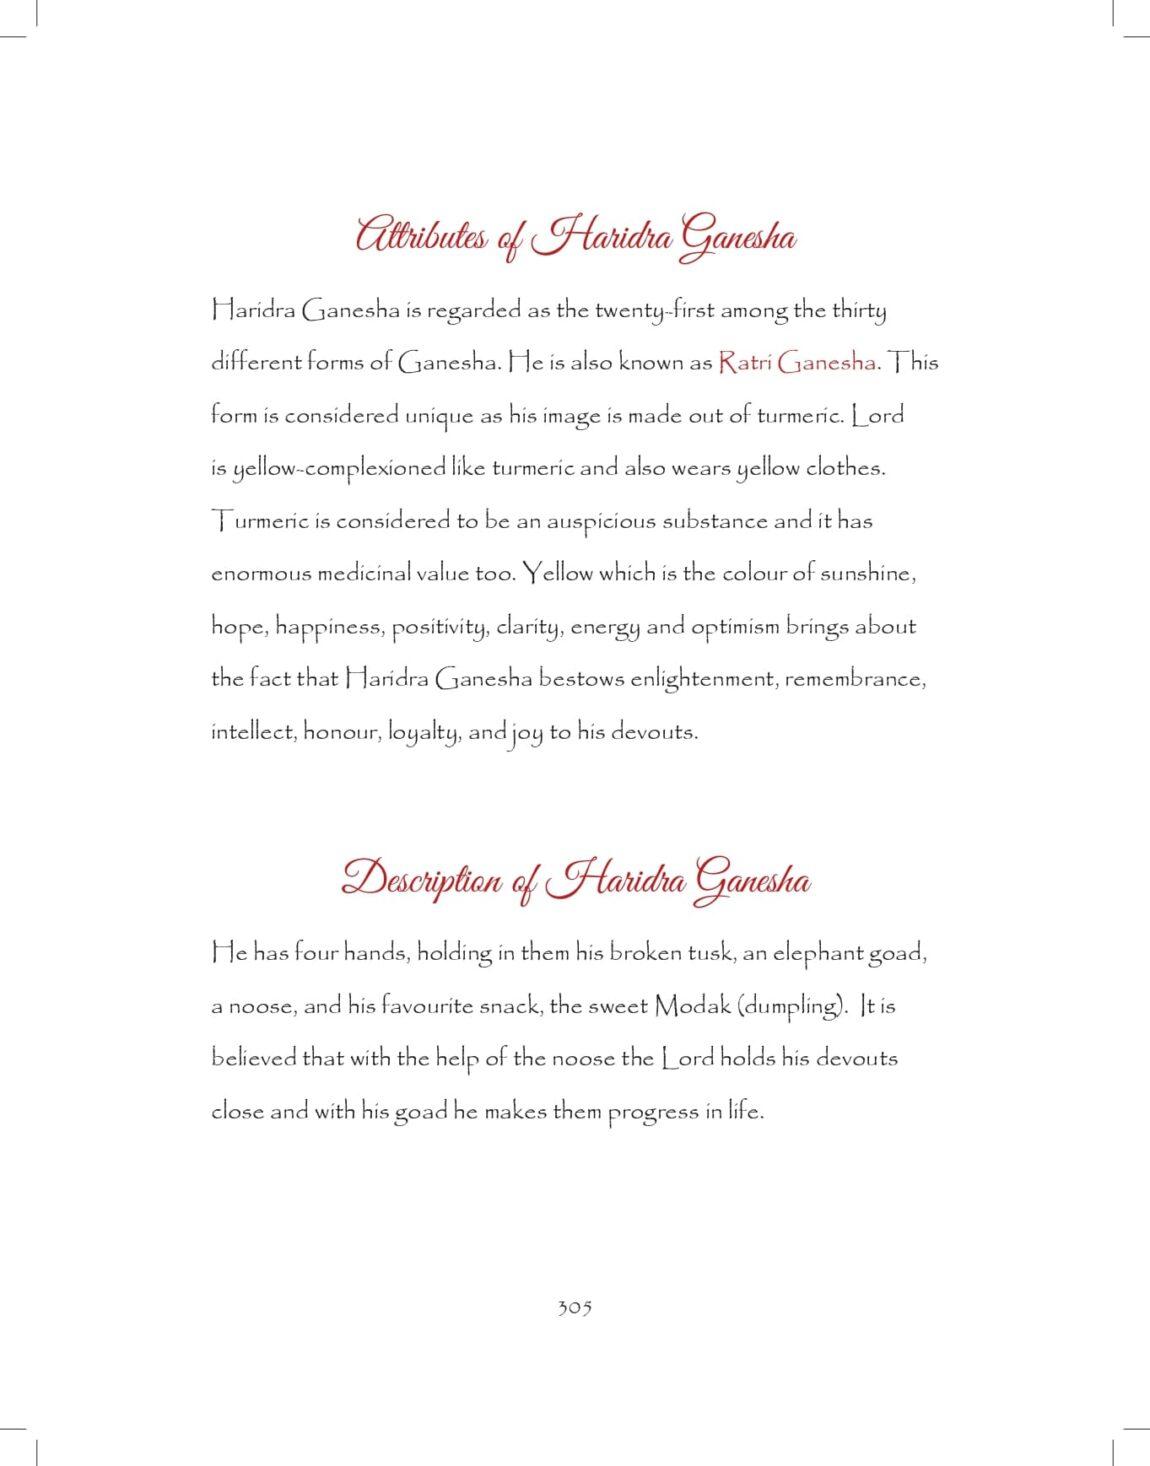 Ganesh-print_pages-to-jpg-0305.jpg